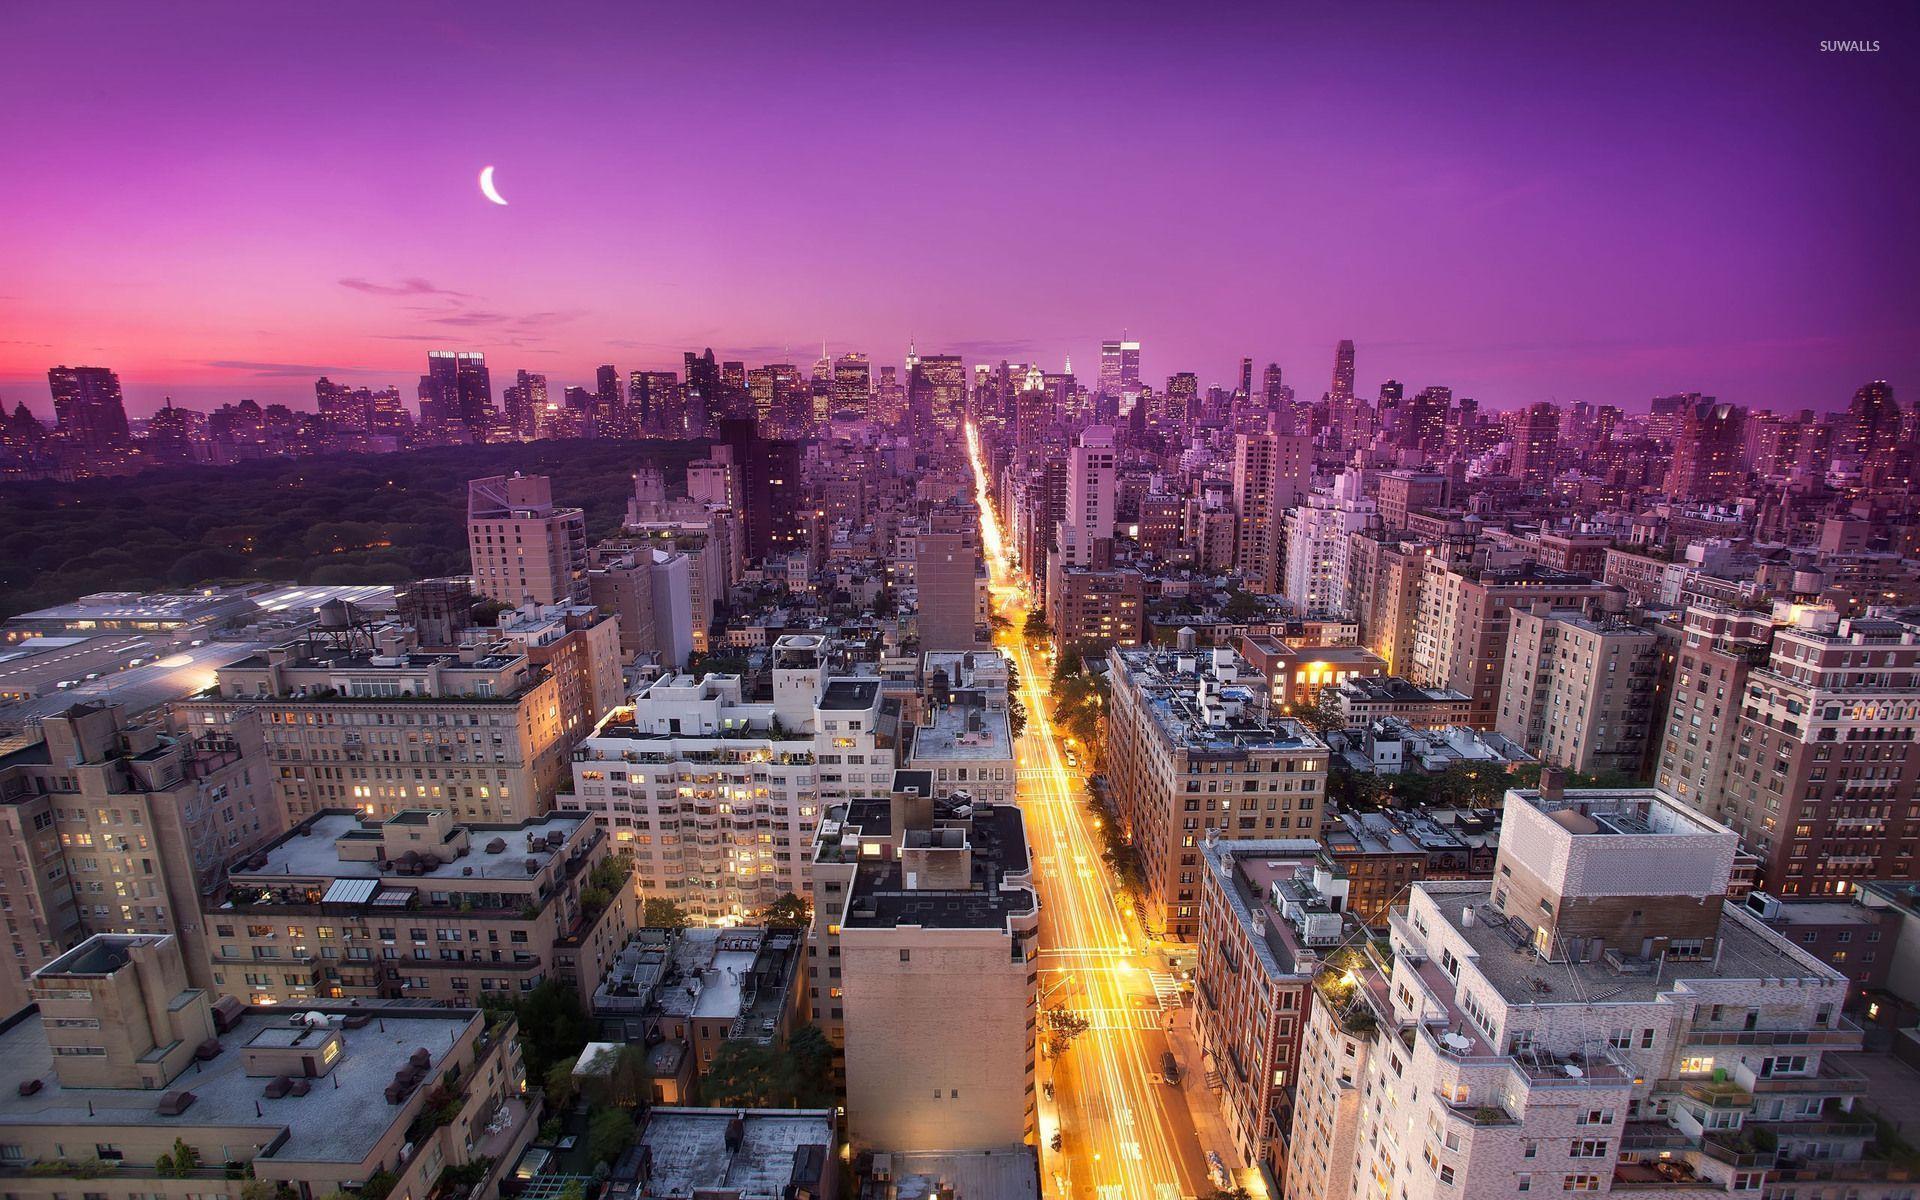 city sunset wallpaper 7106 - photo #24